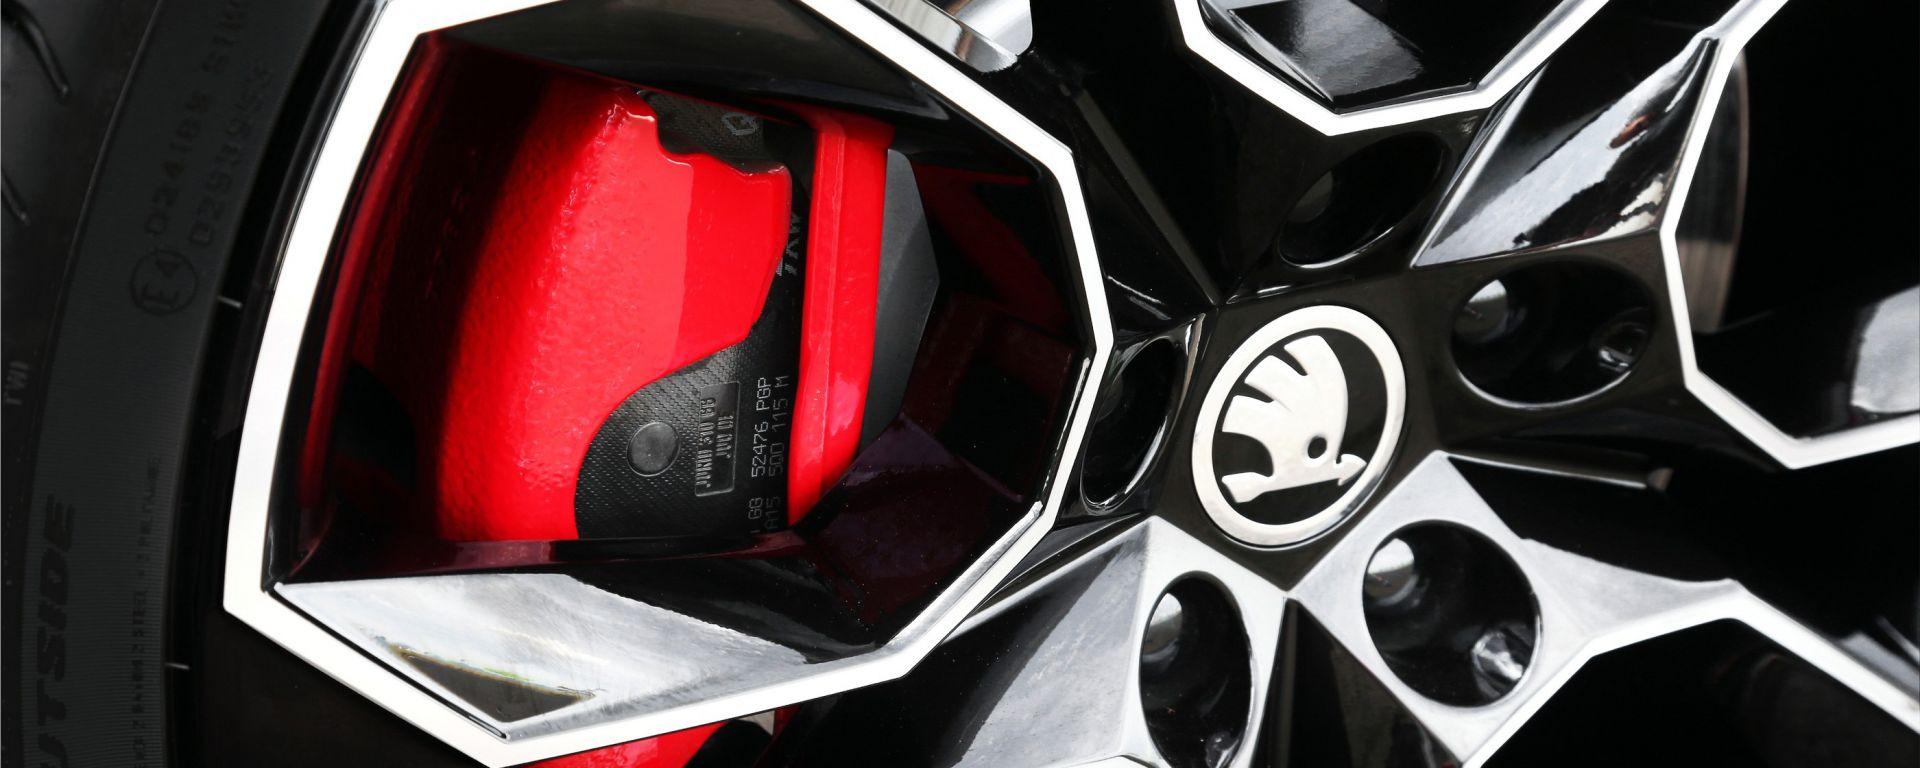 Skoda Octavia Wagon RS 4x4